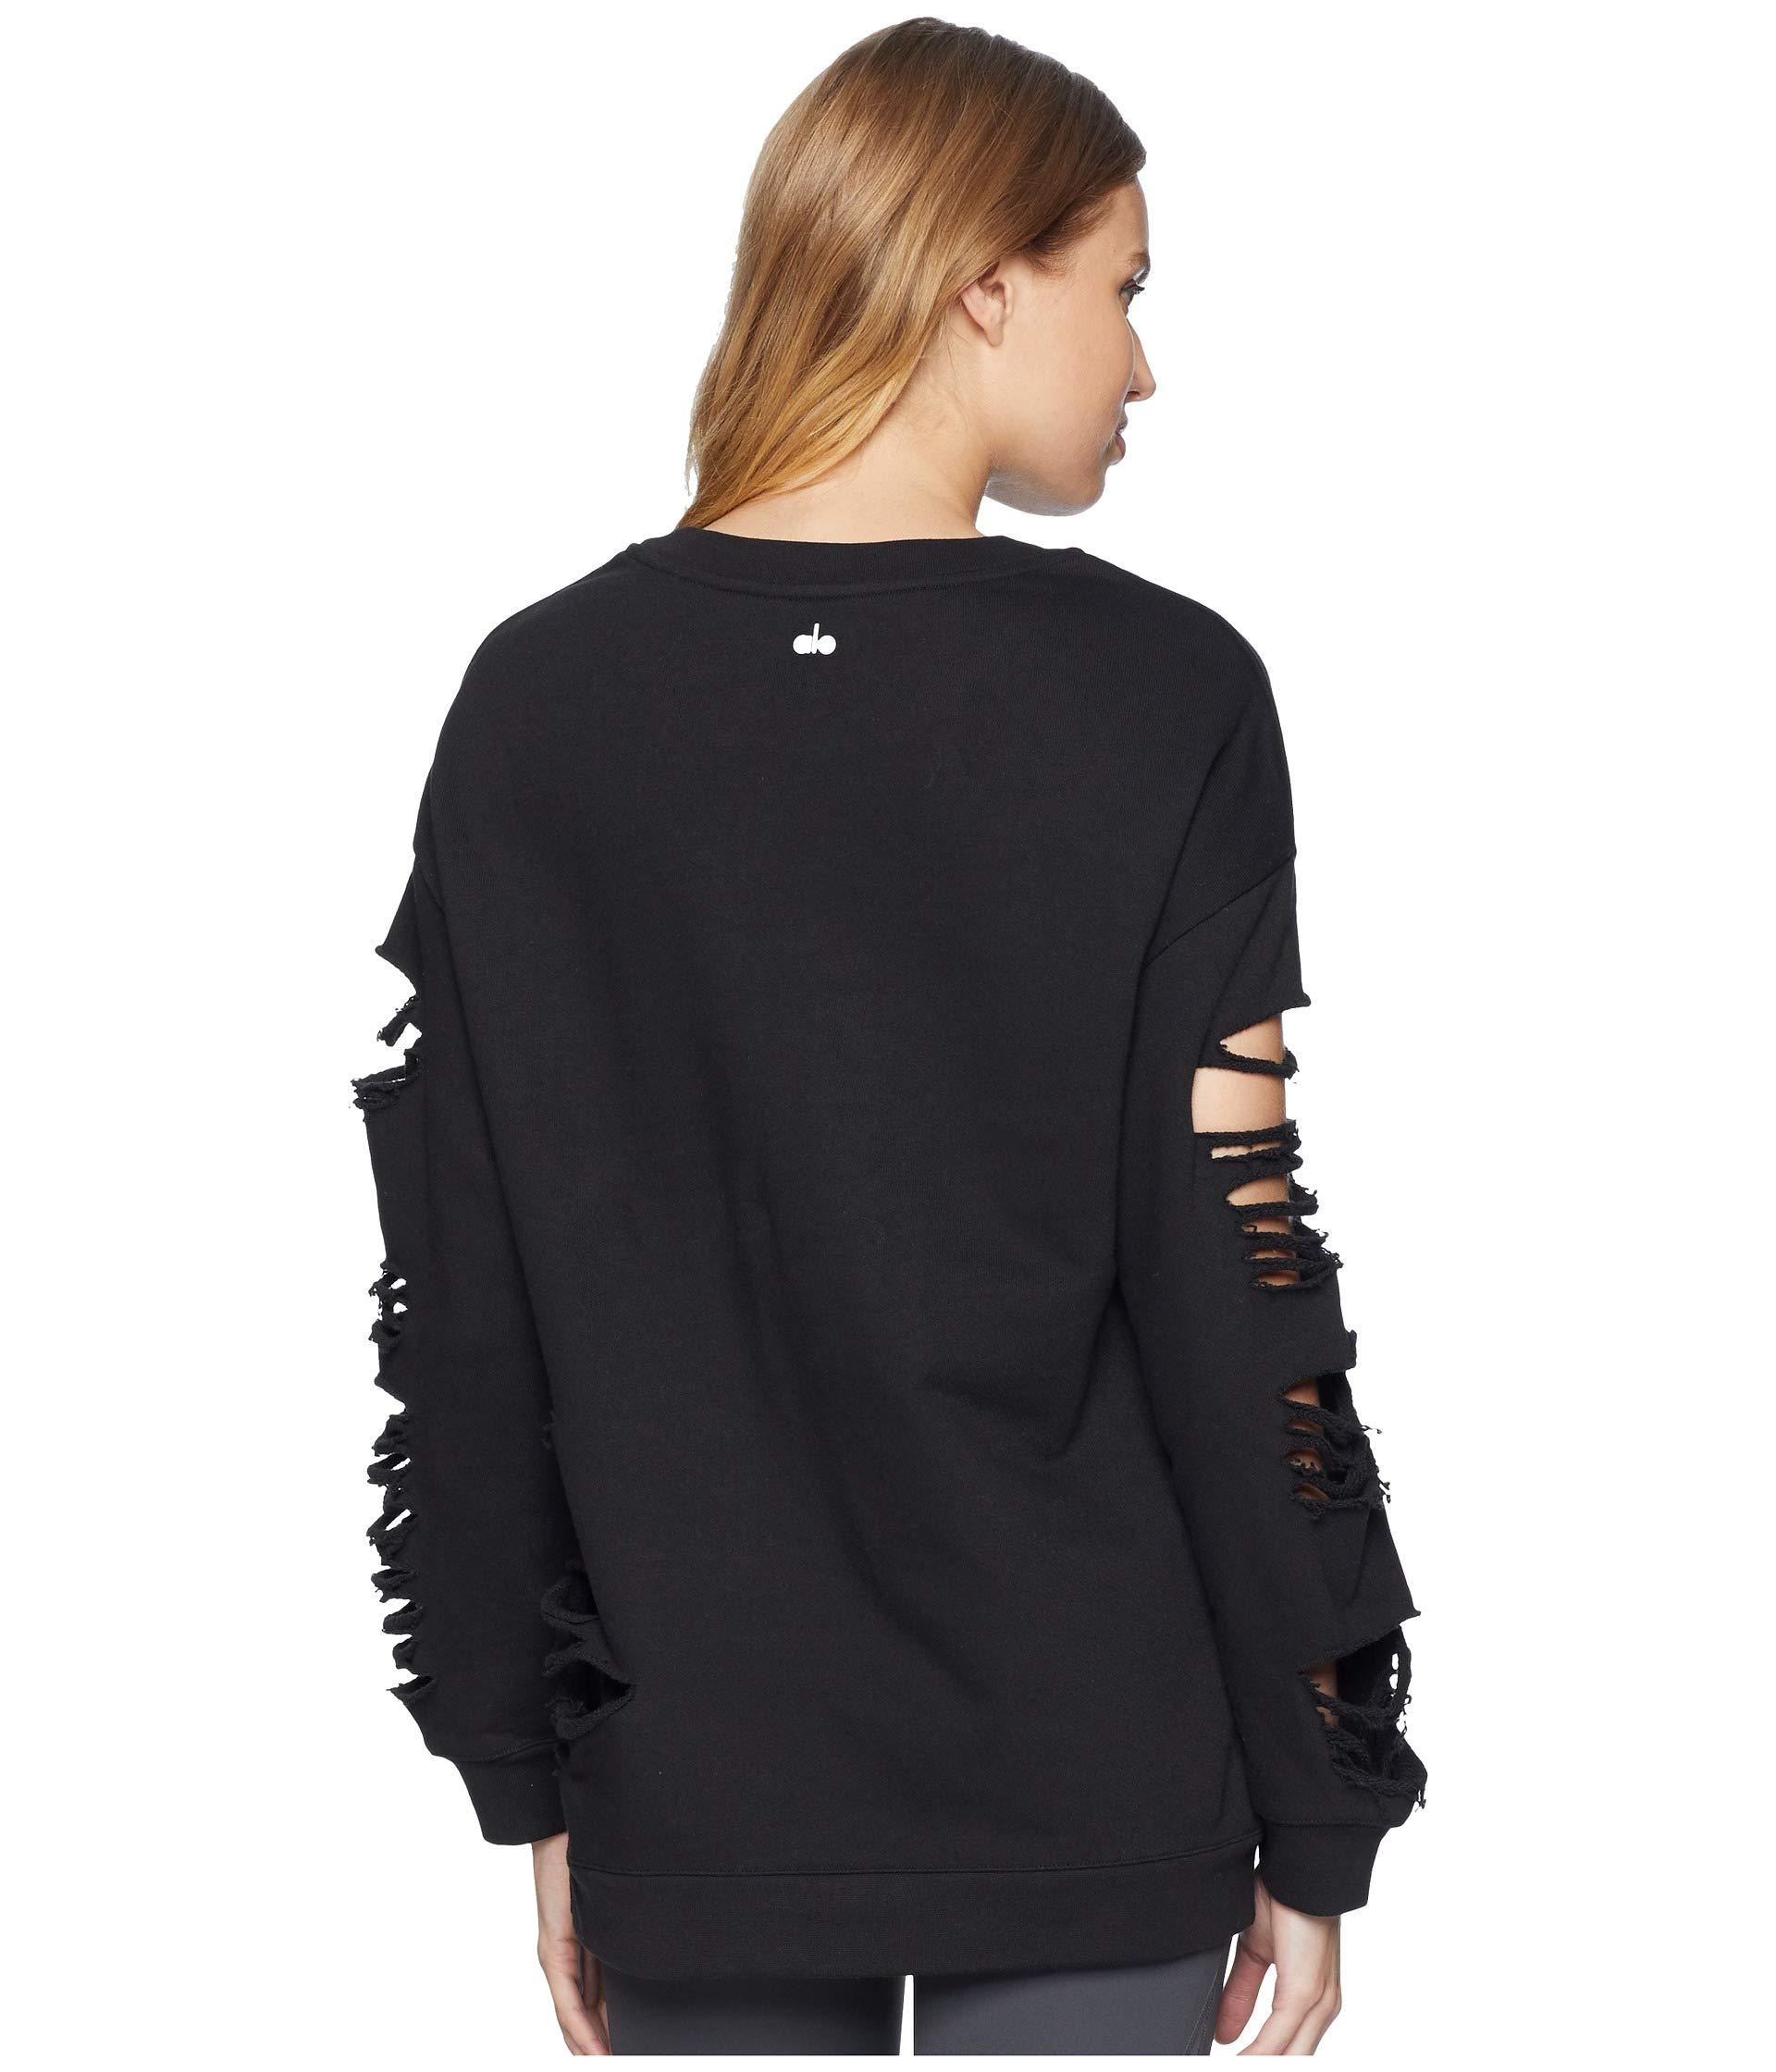 Black Long Fade Alo Pullover Sleeve nv466x